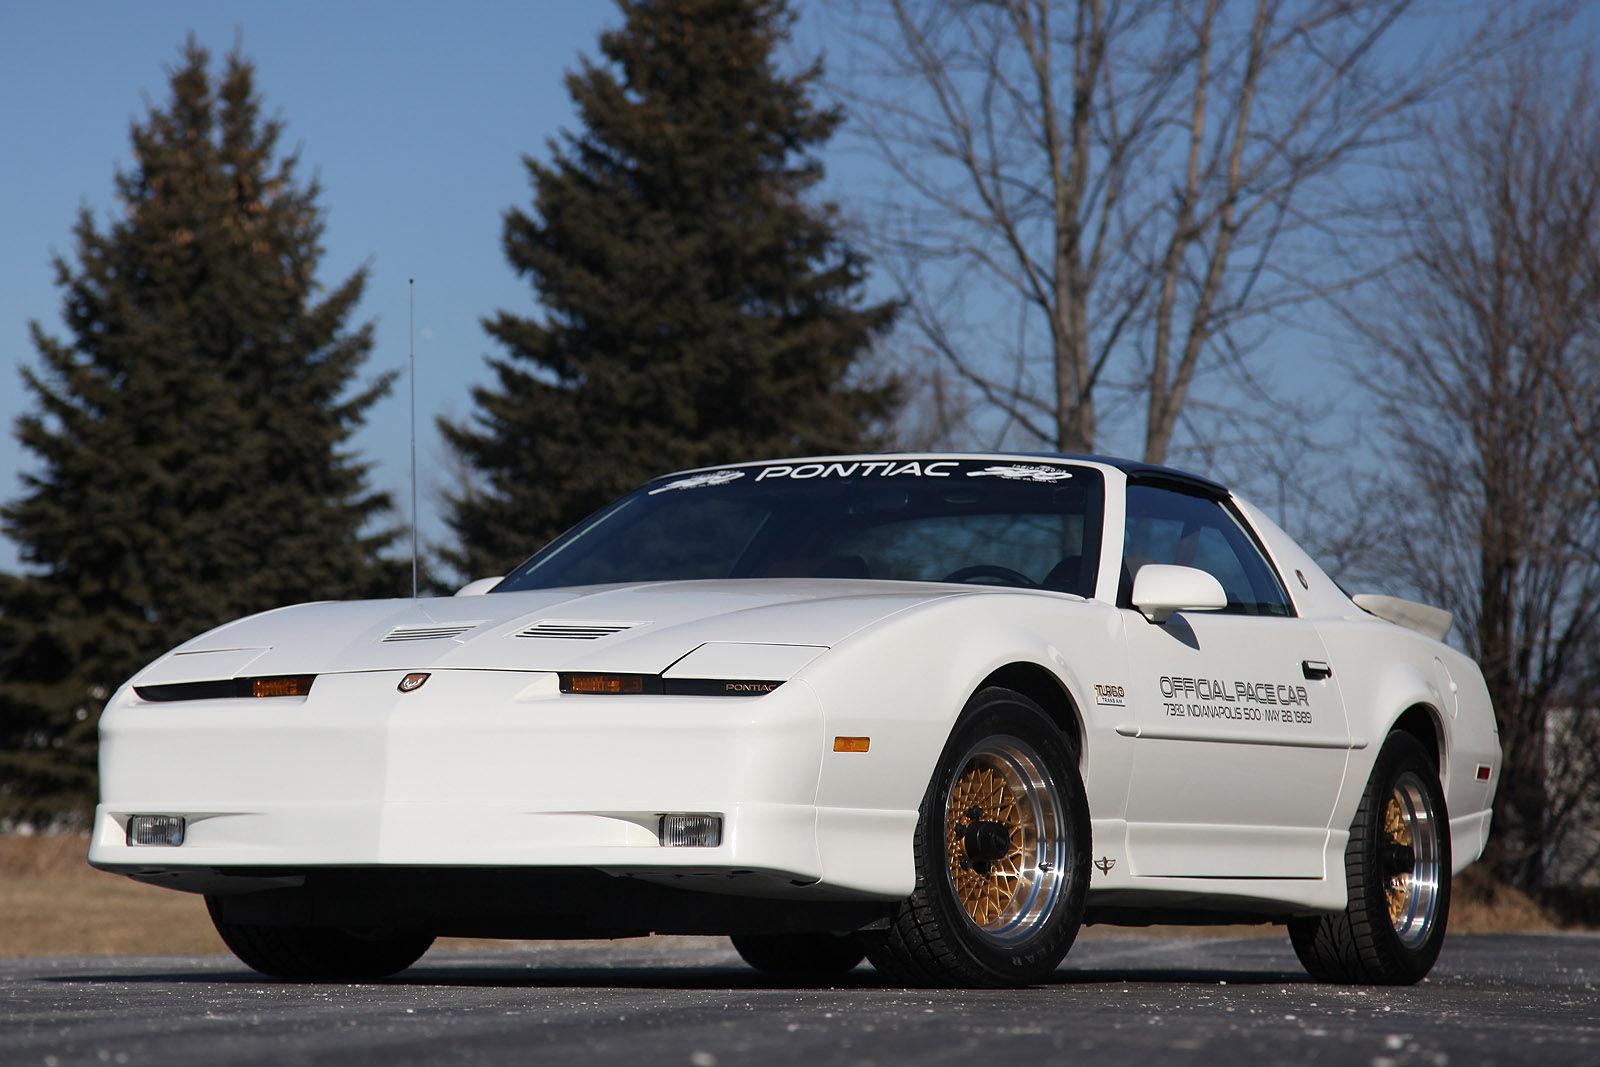 1989 Pontiac Trans Am | 1989 Trans Am Turbo Pace Car